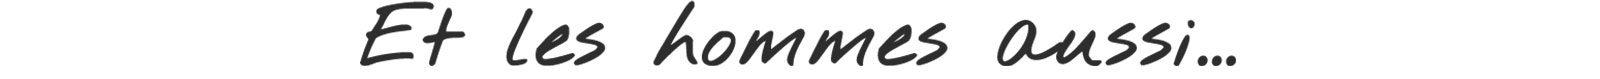 http://chantier.allee-du-foulard.fr/wp-content/uploads/2017/12/0641-ADF-LB-lookfete-titre-leshommes-1600x79.jpg